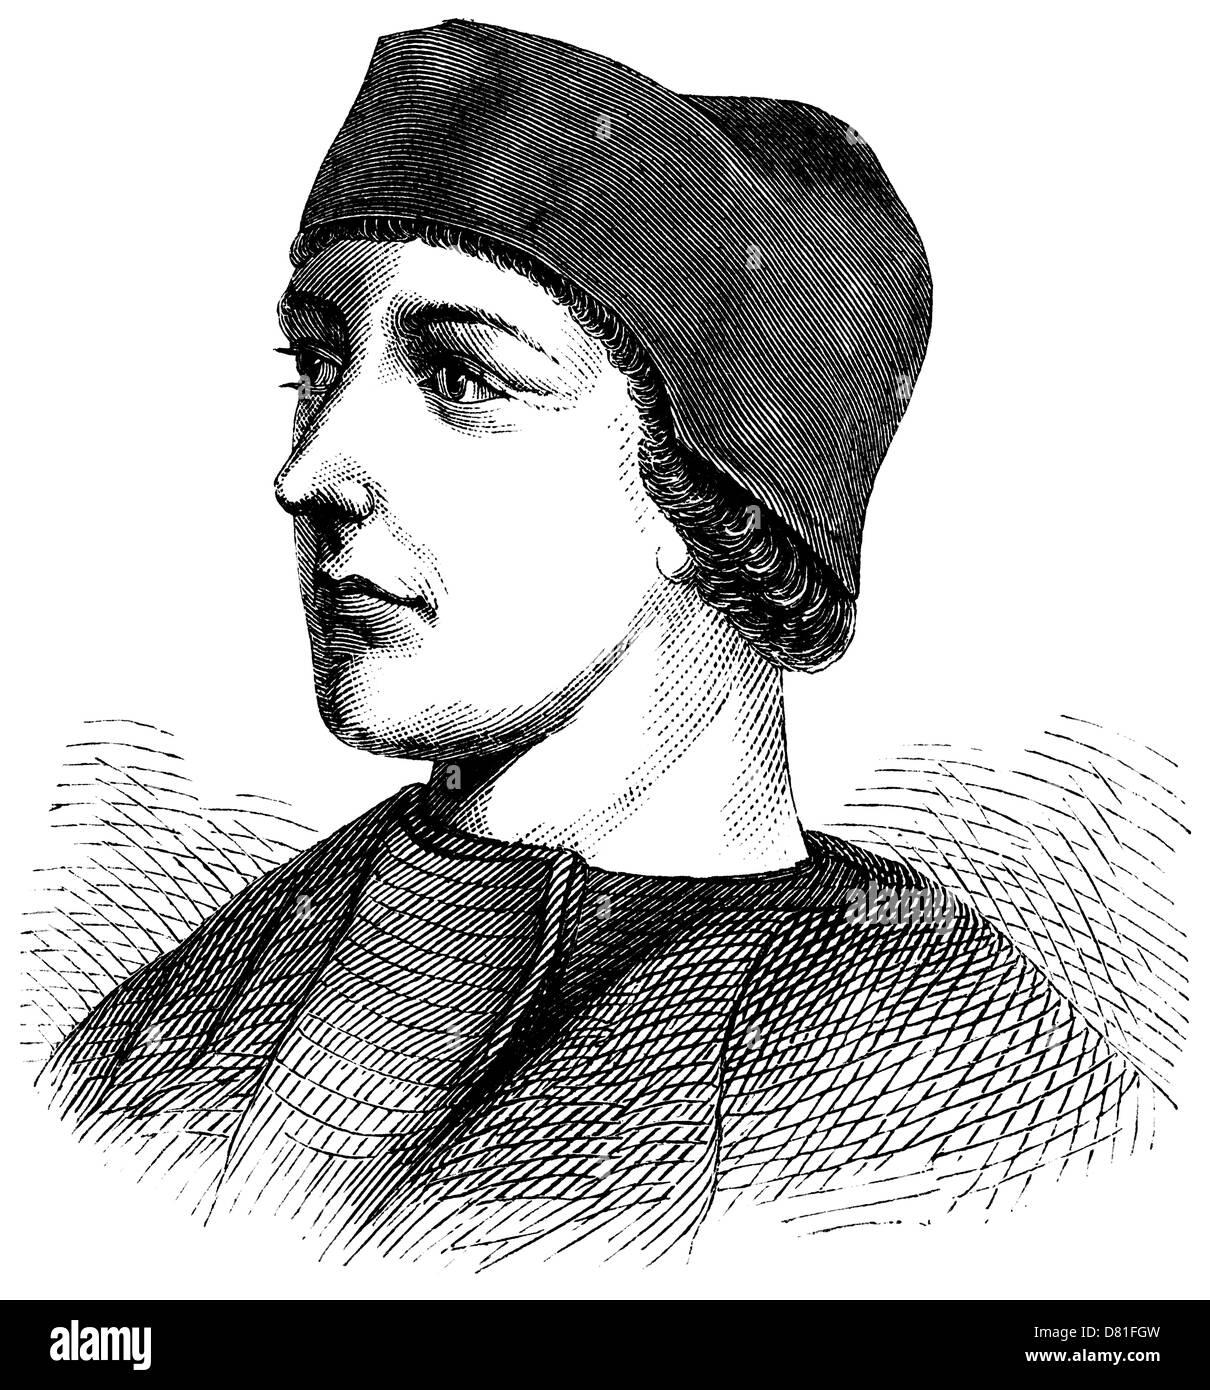 Vintage portrait of Dean John Colet (1466-1519), an engraving or wood-cut; John Colet founded St. Paul's School - Stock Image